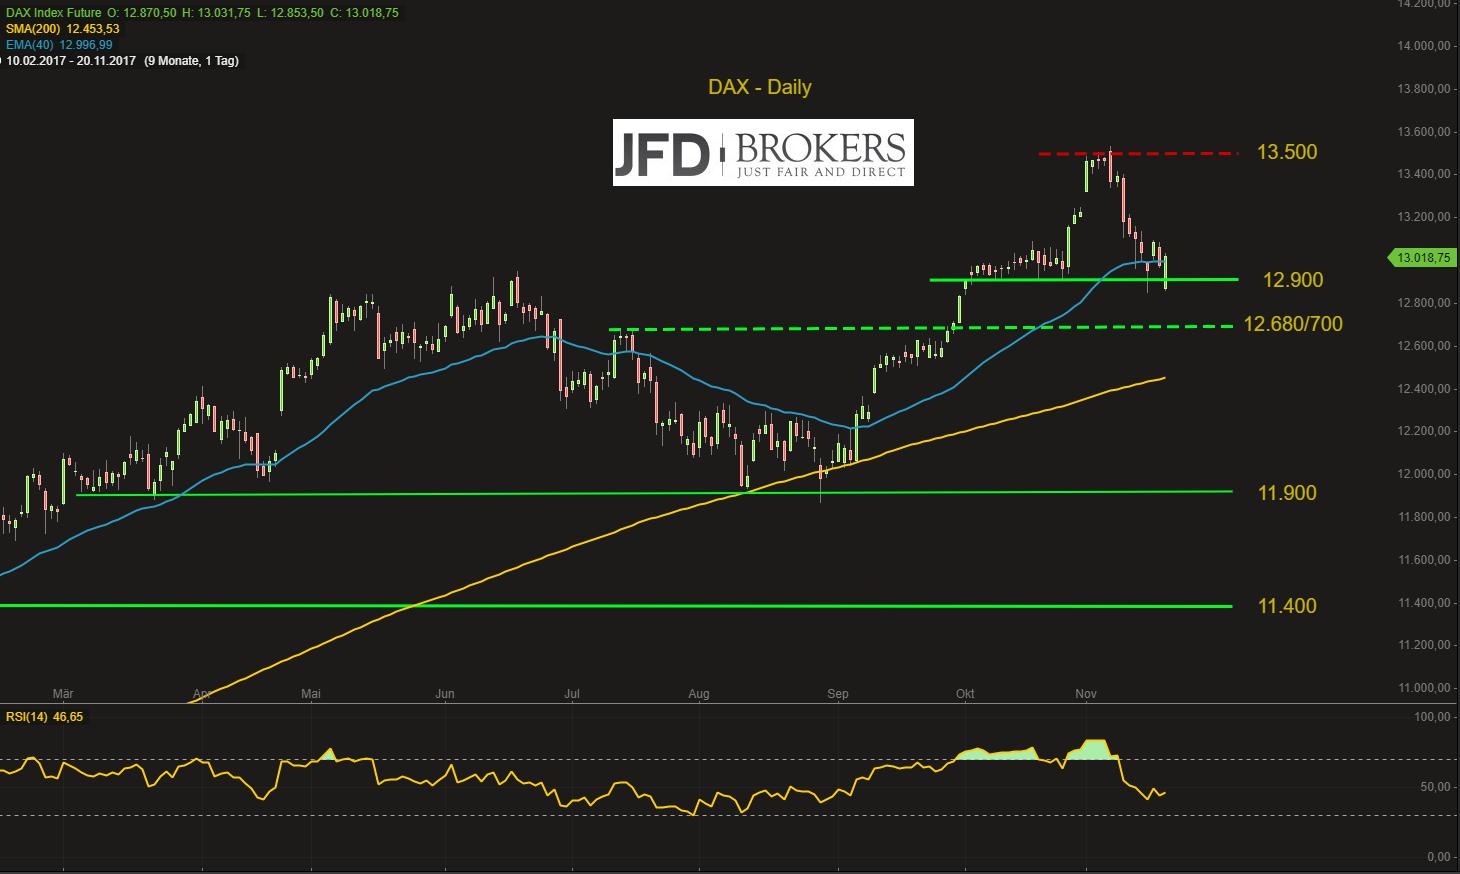 Jamaika-scheitert-doch-DAX-schüttelt-politische-Sorgen-zügig-ab-Kommentar-JFD-Brokers-GodmodeTrader.de-2